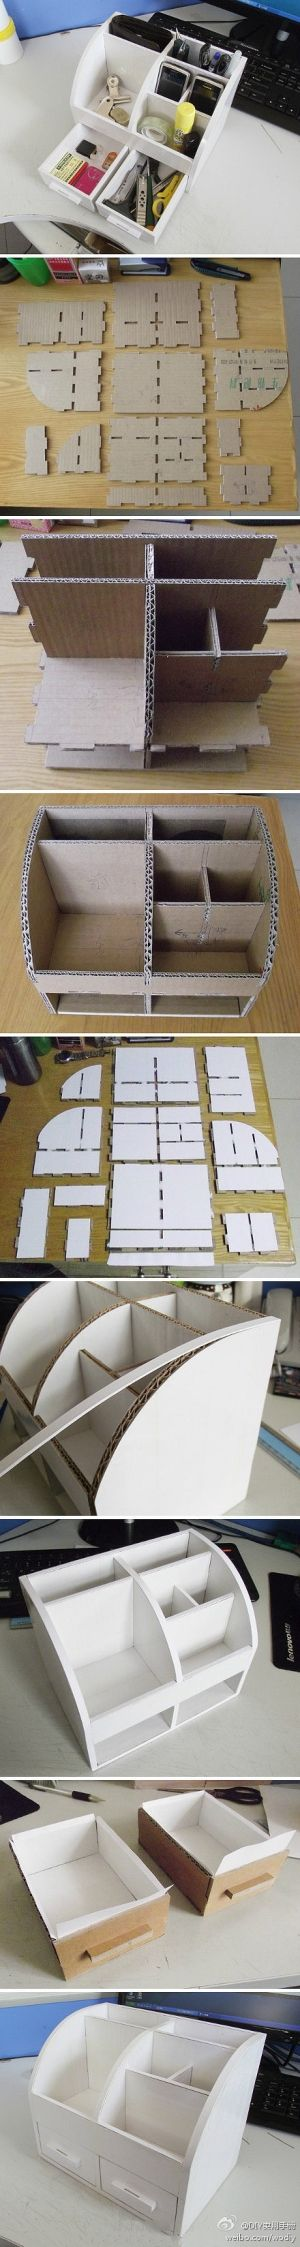 Cardboard stuff organizer DIY - photo TUTORIAL